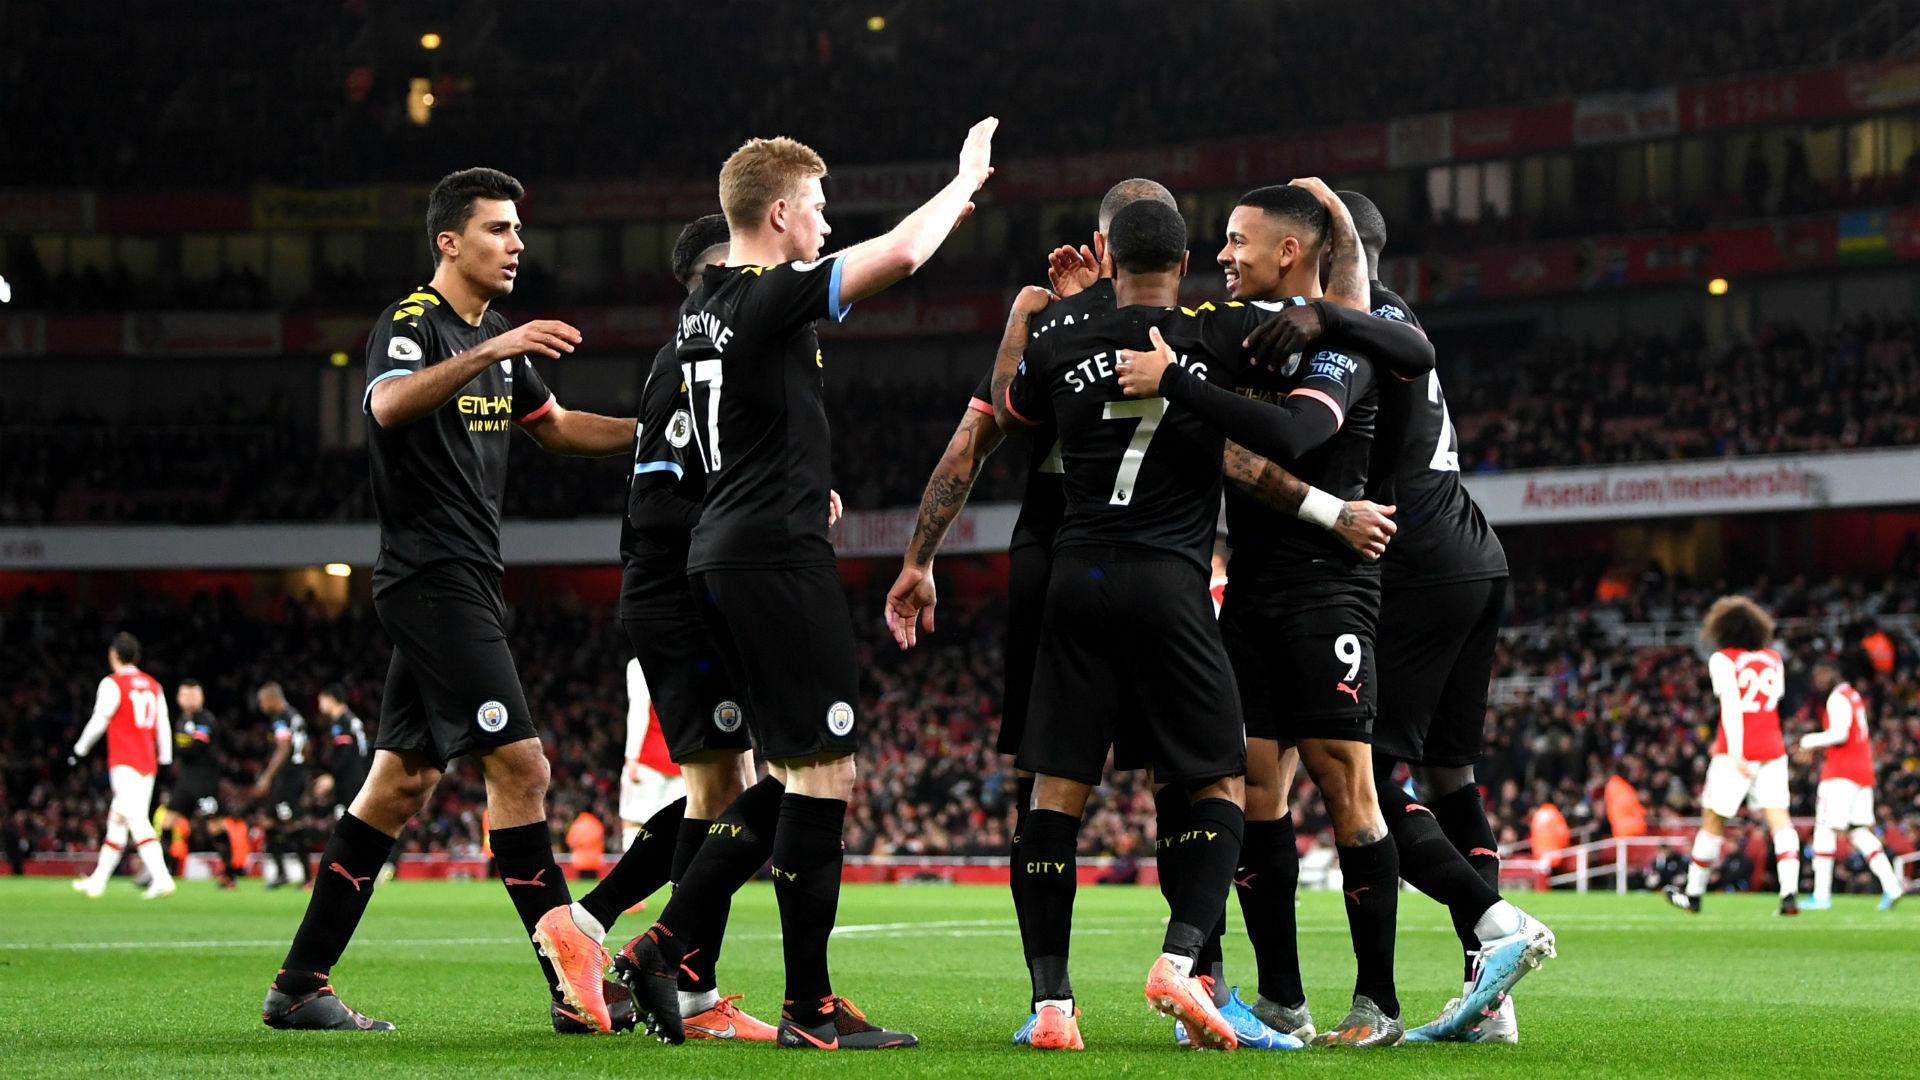 Coronavirus: Premier League to restart on June 17